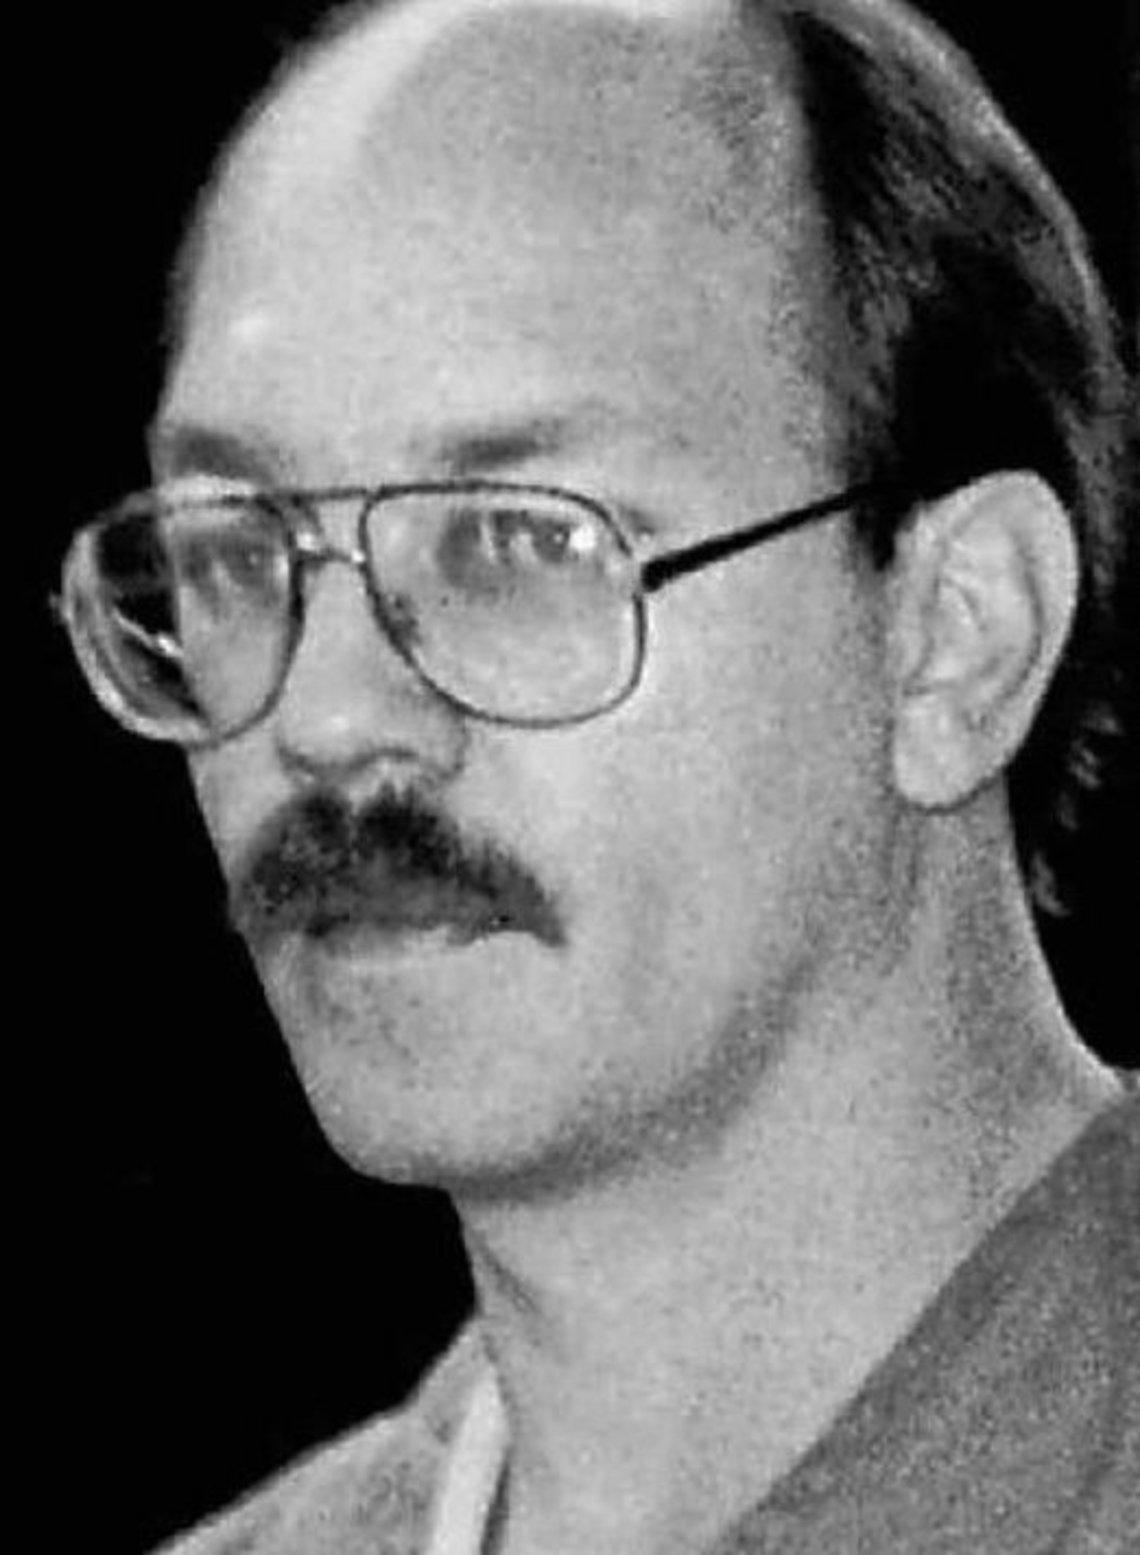 South Dakota jurors sent Charles Rhines, pictured, to death row for fatally stabbing Donnivan Schaeffer.